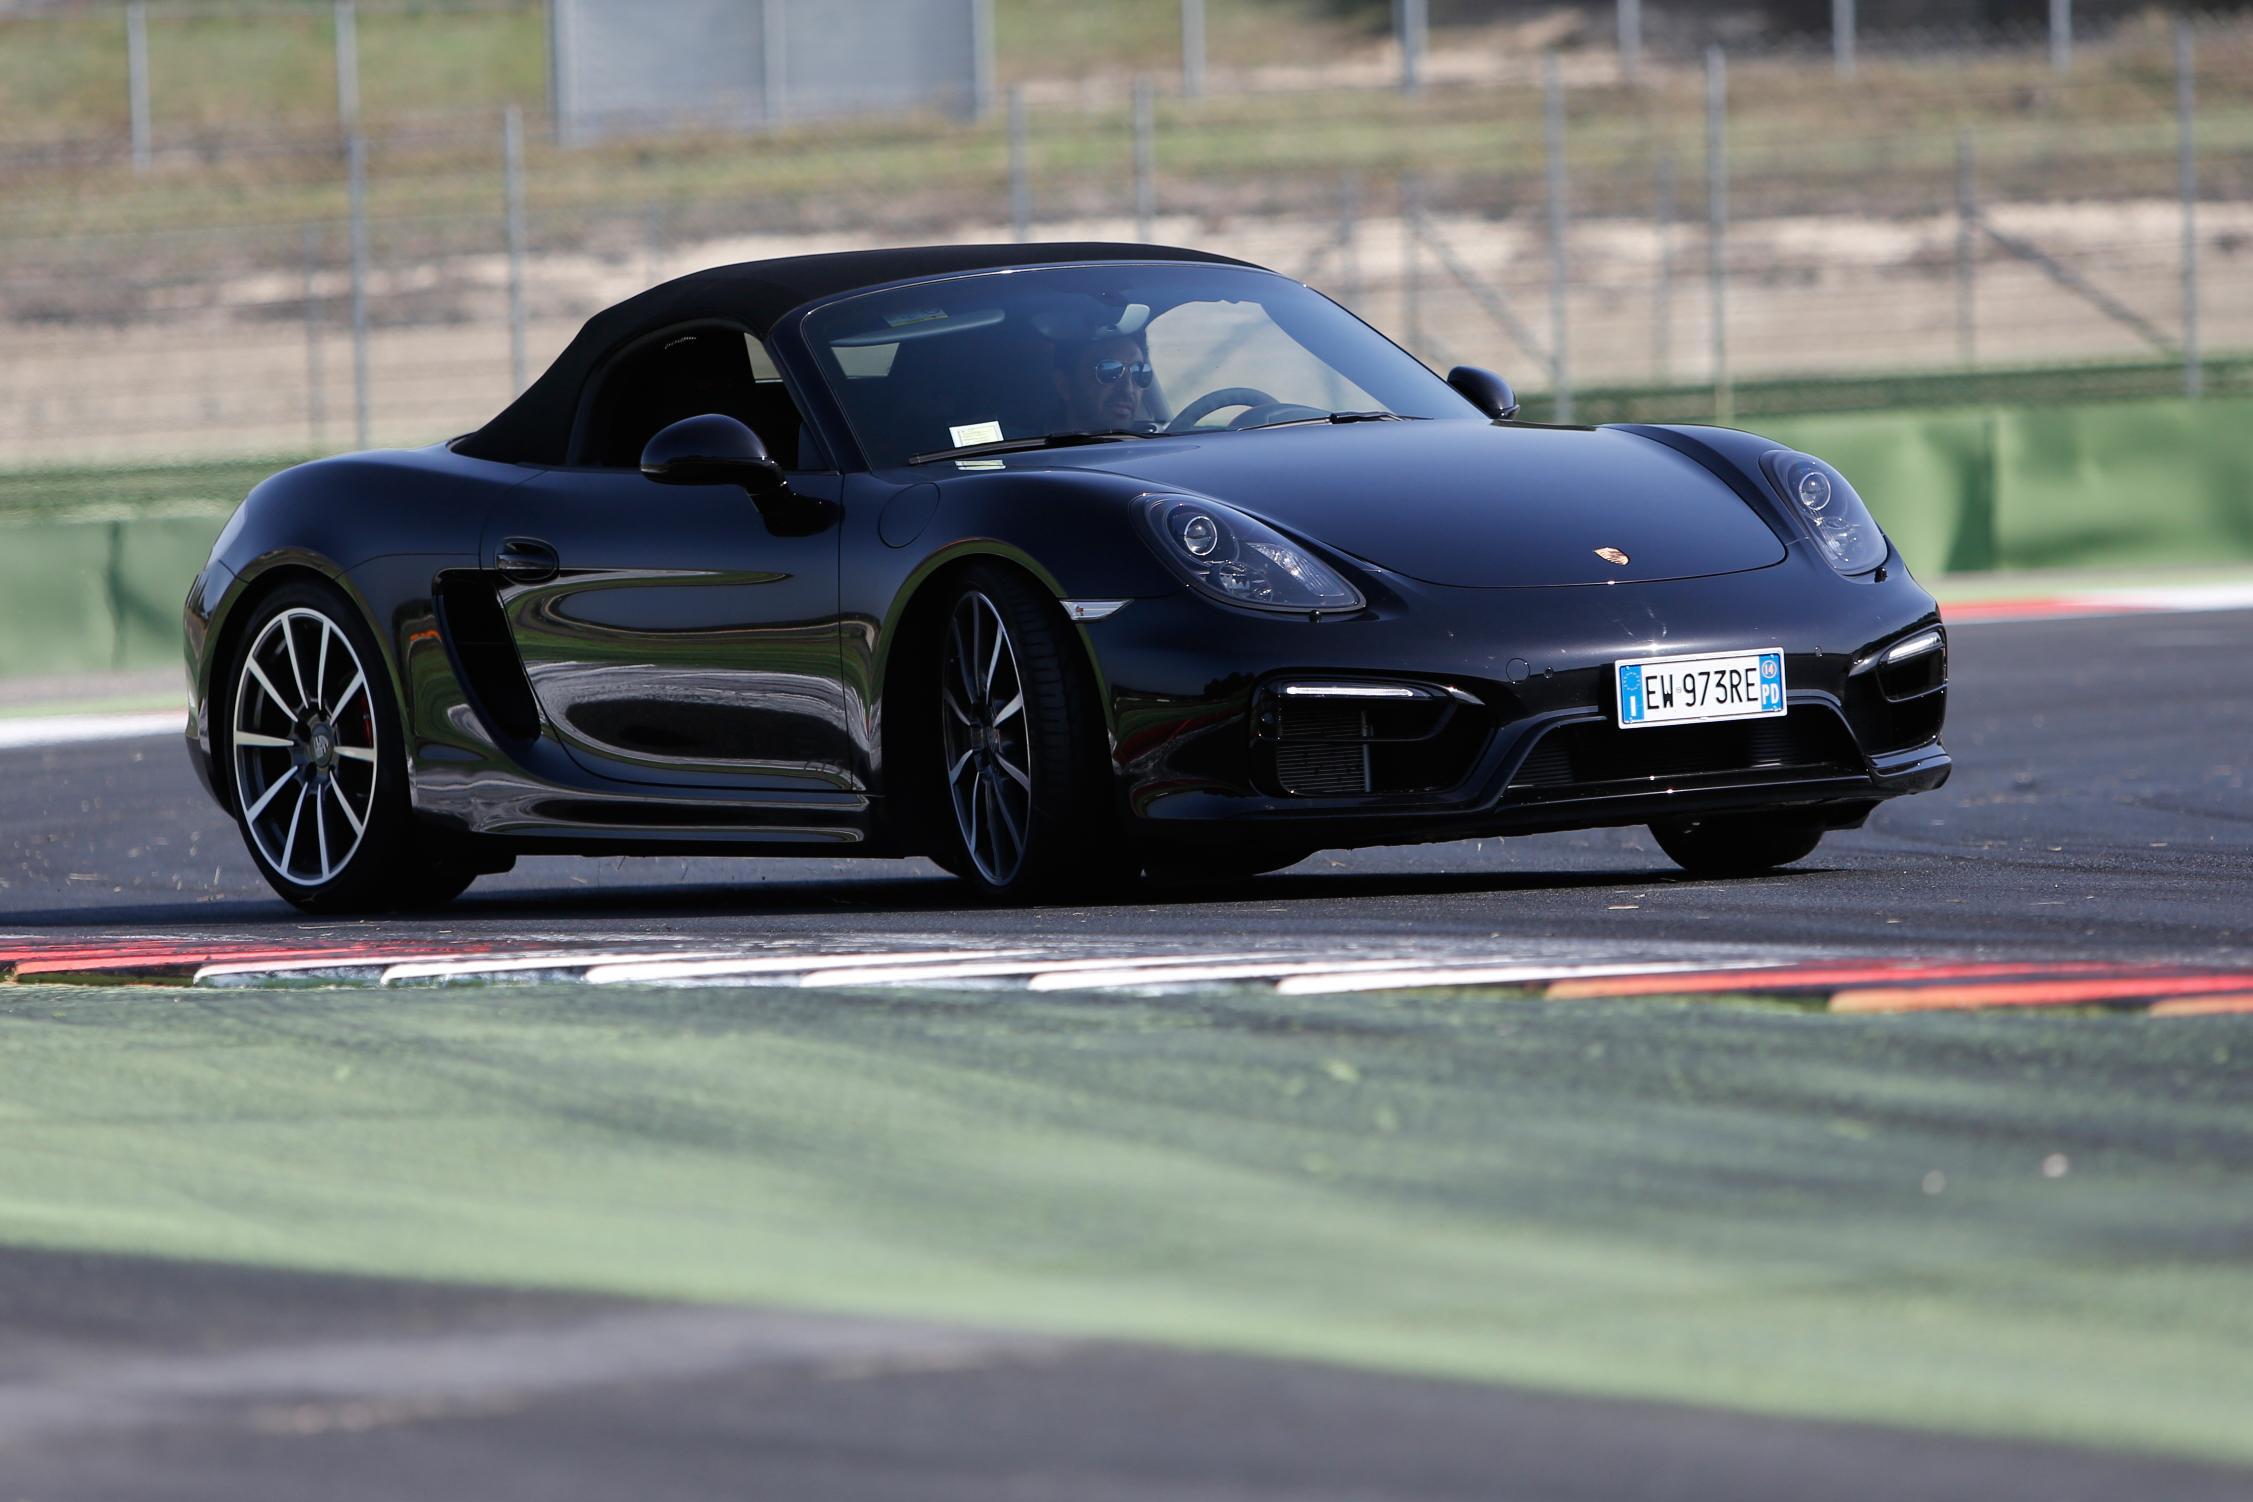 Porsche Boxter GTS, 330 Cv di adrenalina purissima